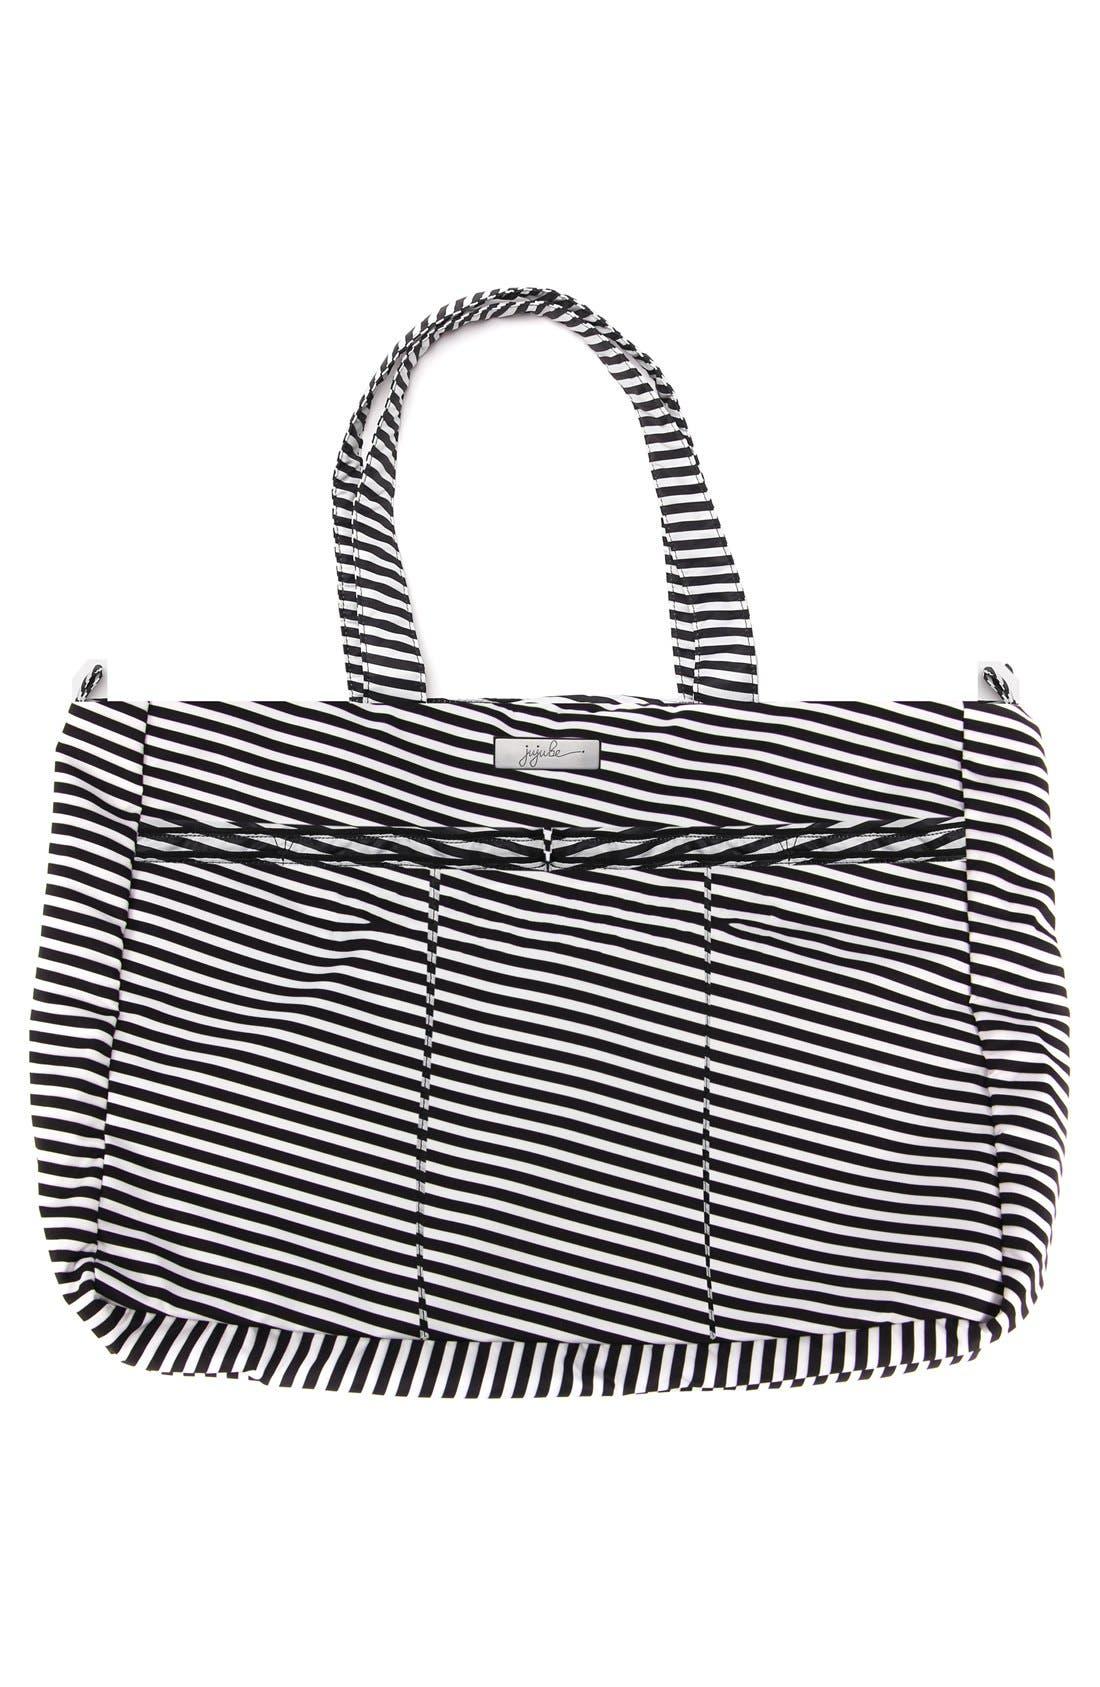 Main Image - Ju-Ju-Be 'Super Be - Onyx Collection' Diaper Bag